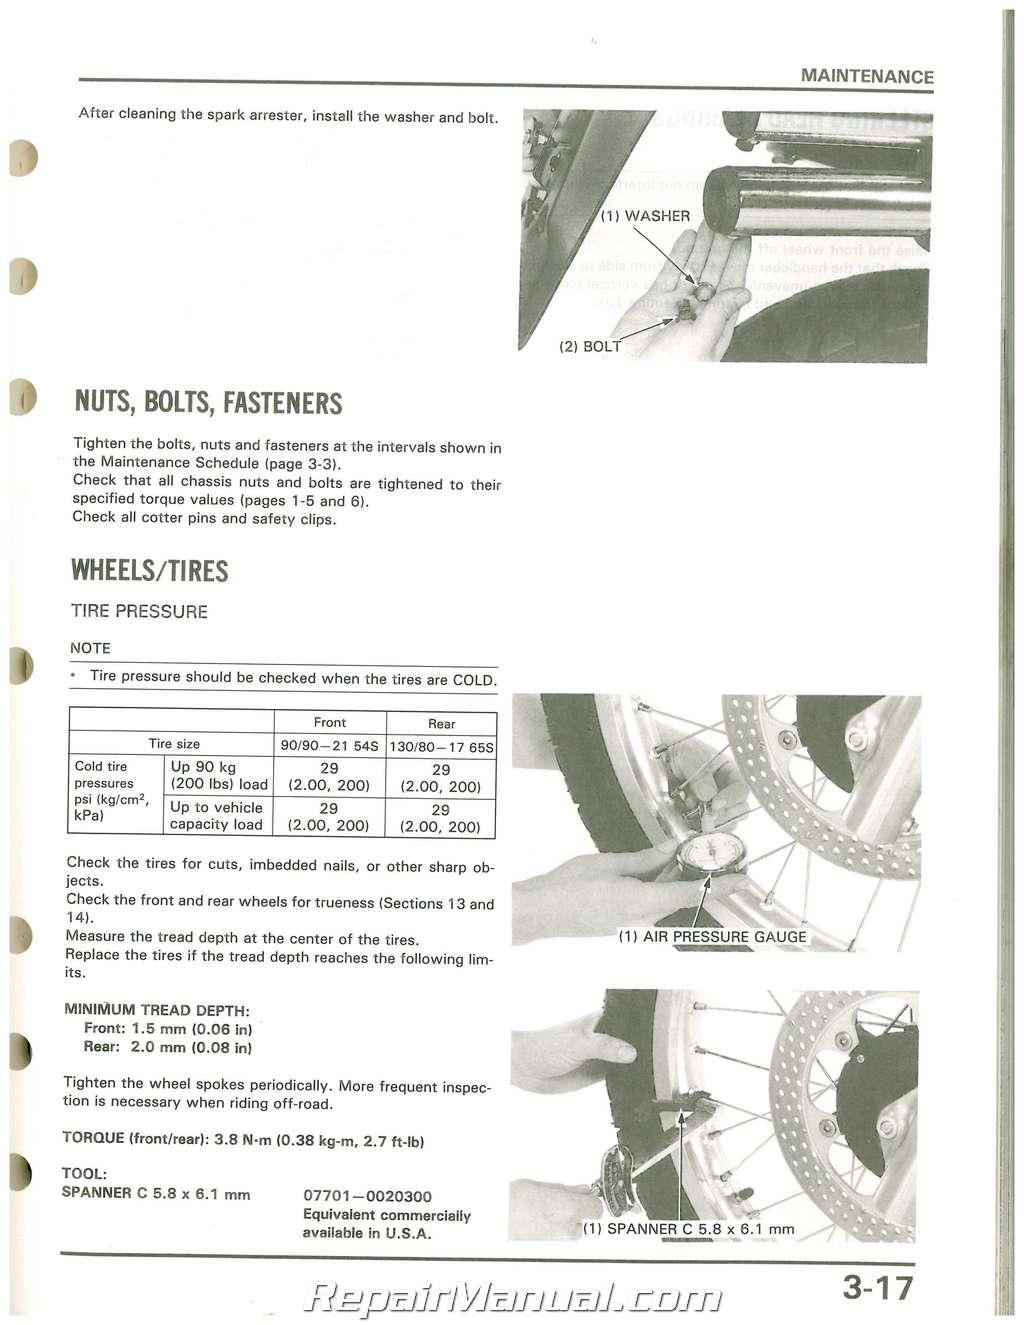 used 1989 1990 honda xl600v transalp service manual. Black Bedroom Furniture Sets. Home Design Ideas